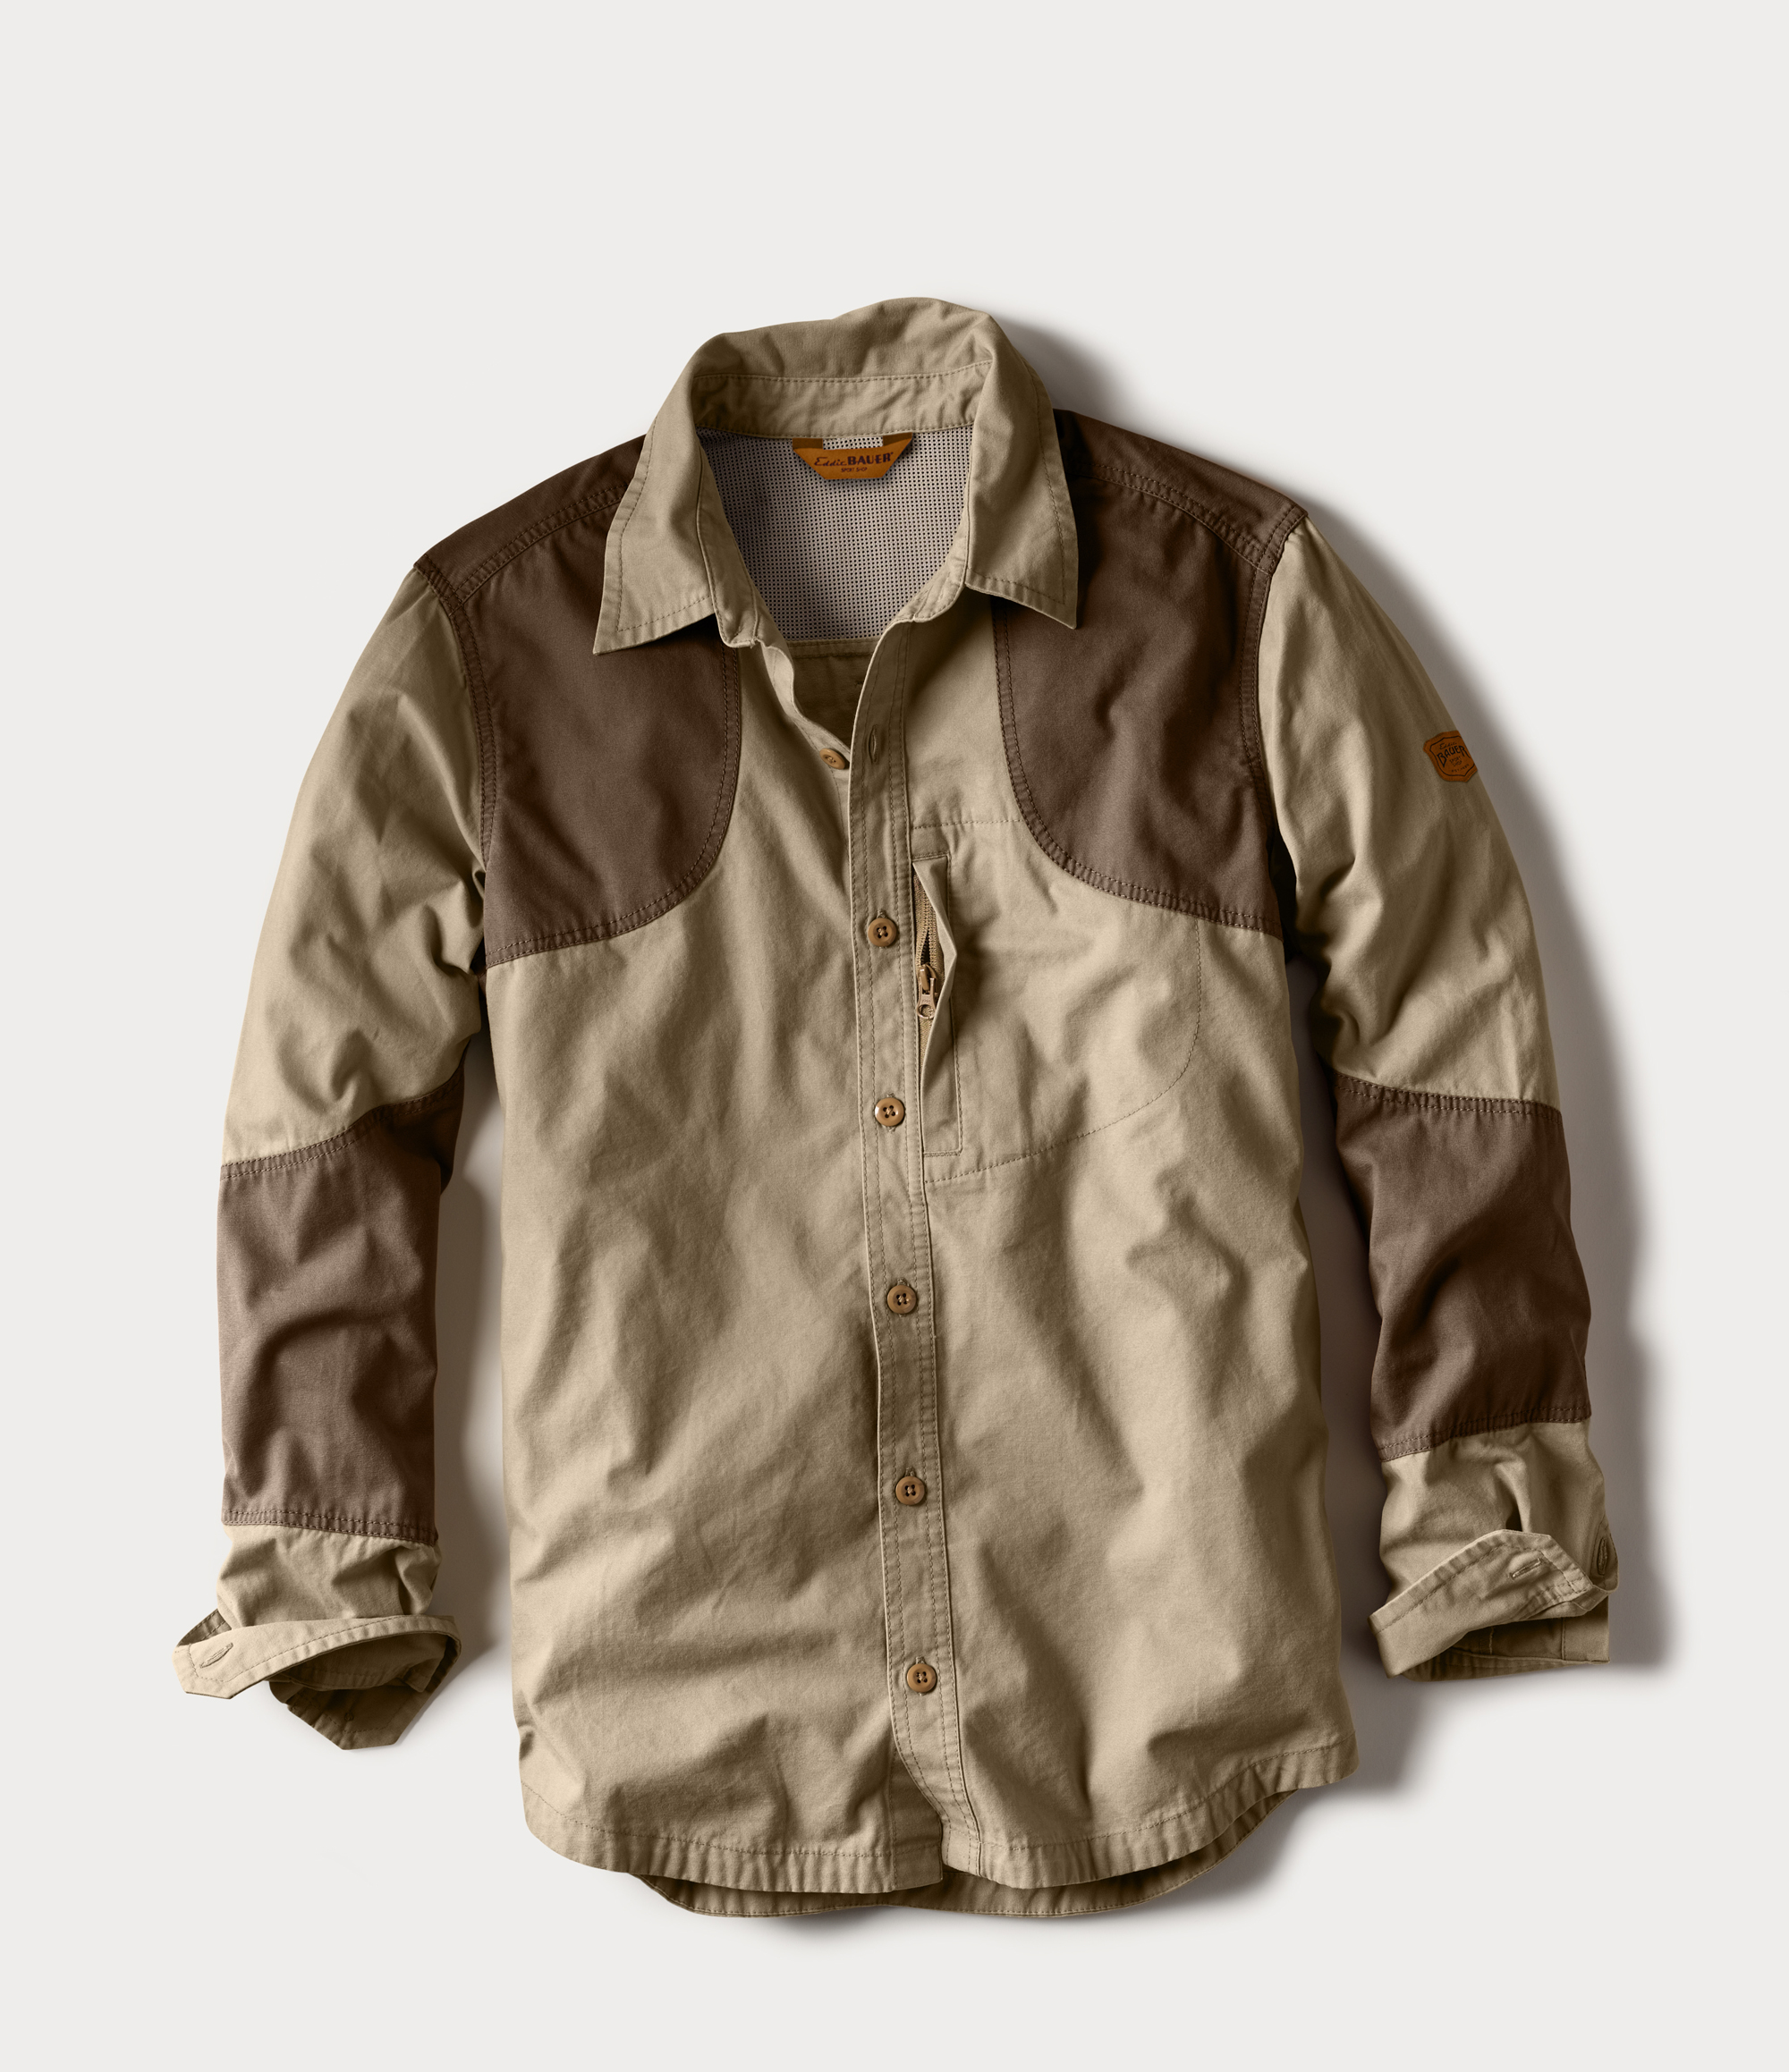 M's Okanogan Hunt Shirt - Tan